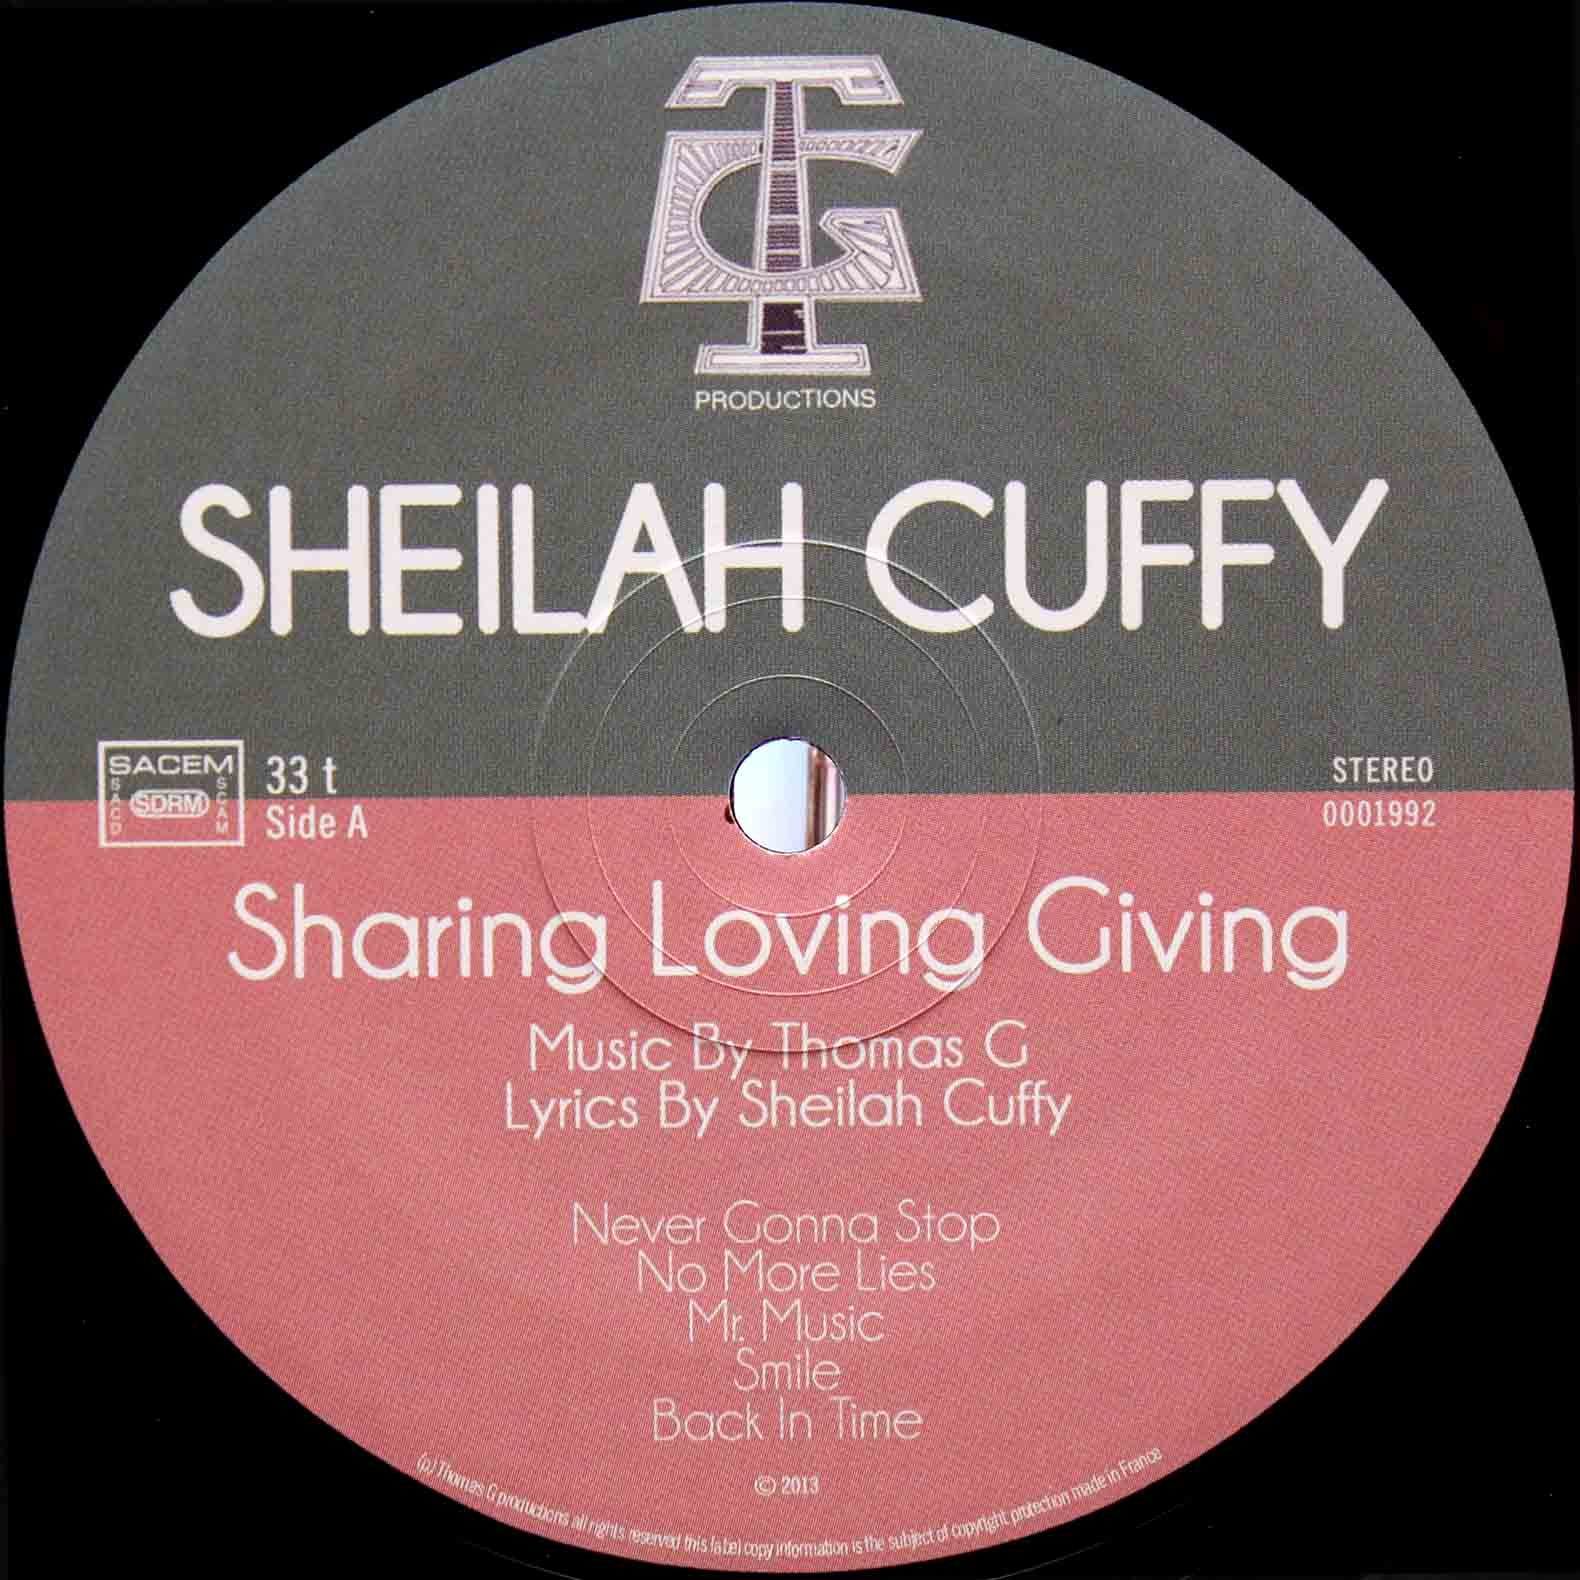 Thomas G Sheilah Cuffy – Sharing Loving Giving 04